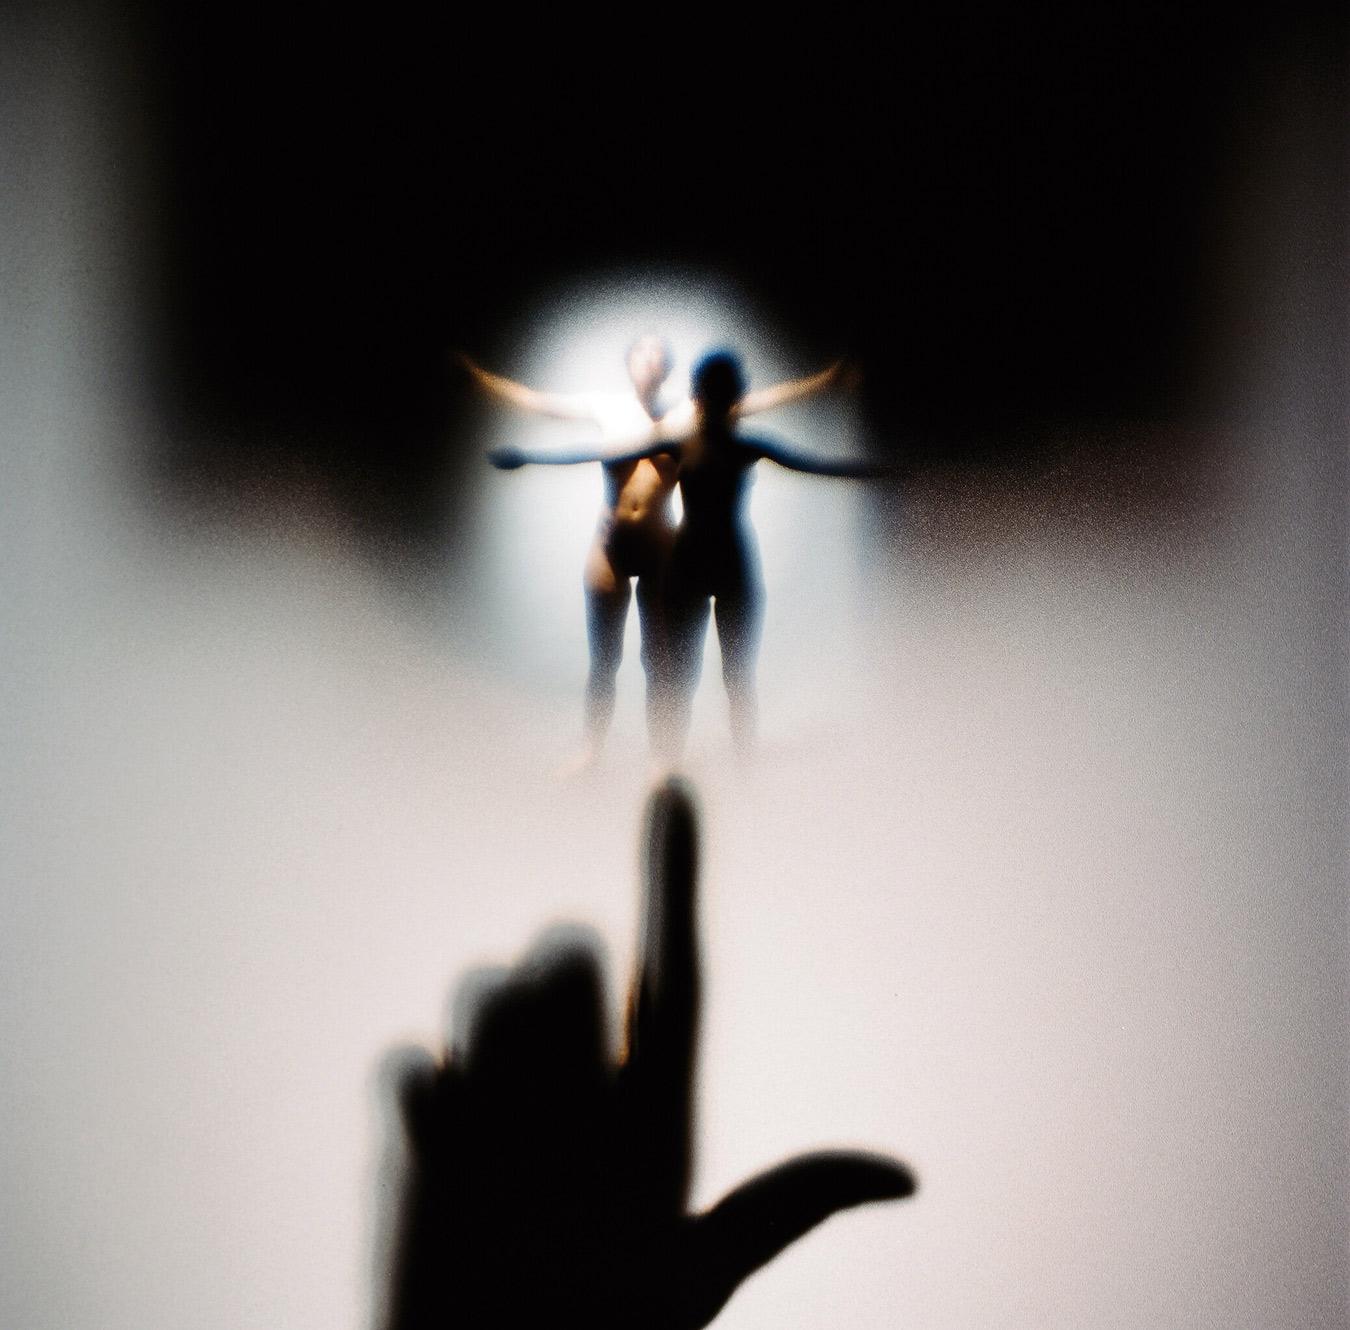 LA SEMILLA DE LA IMAGEN XIV serie I. Fotografía analógica, 2009